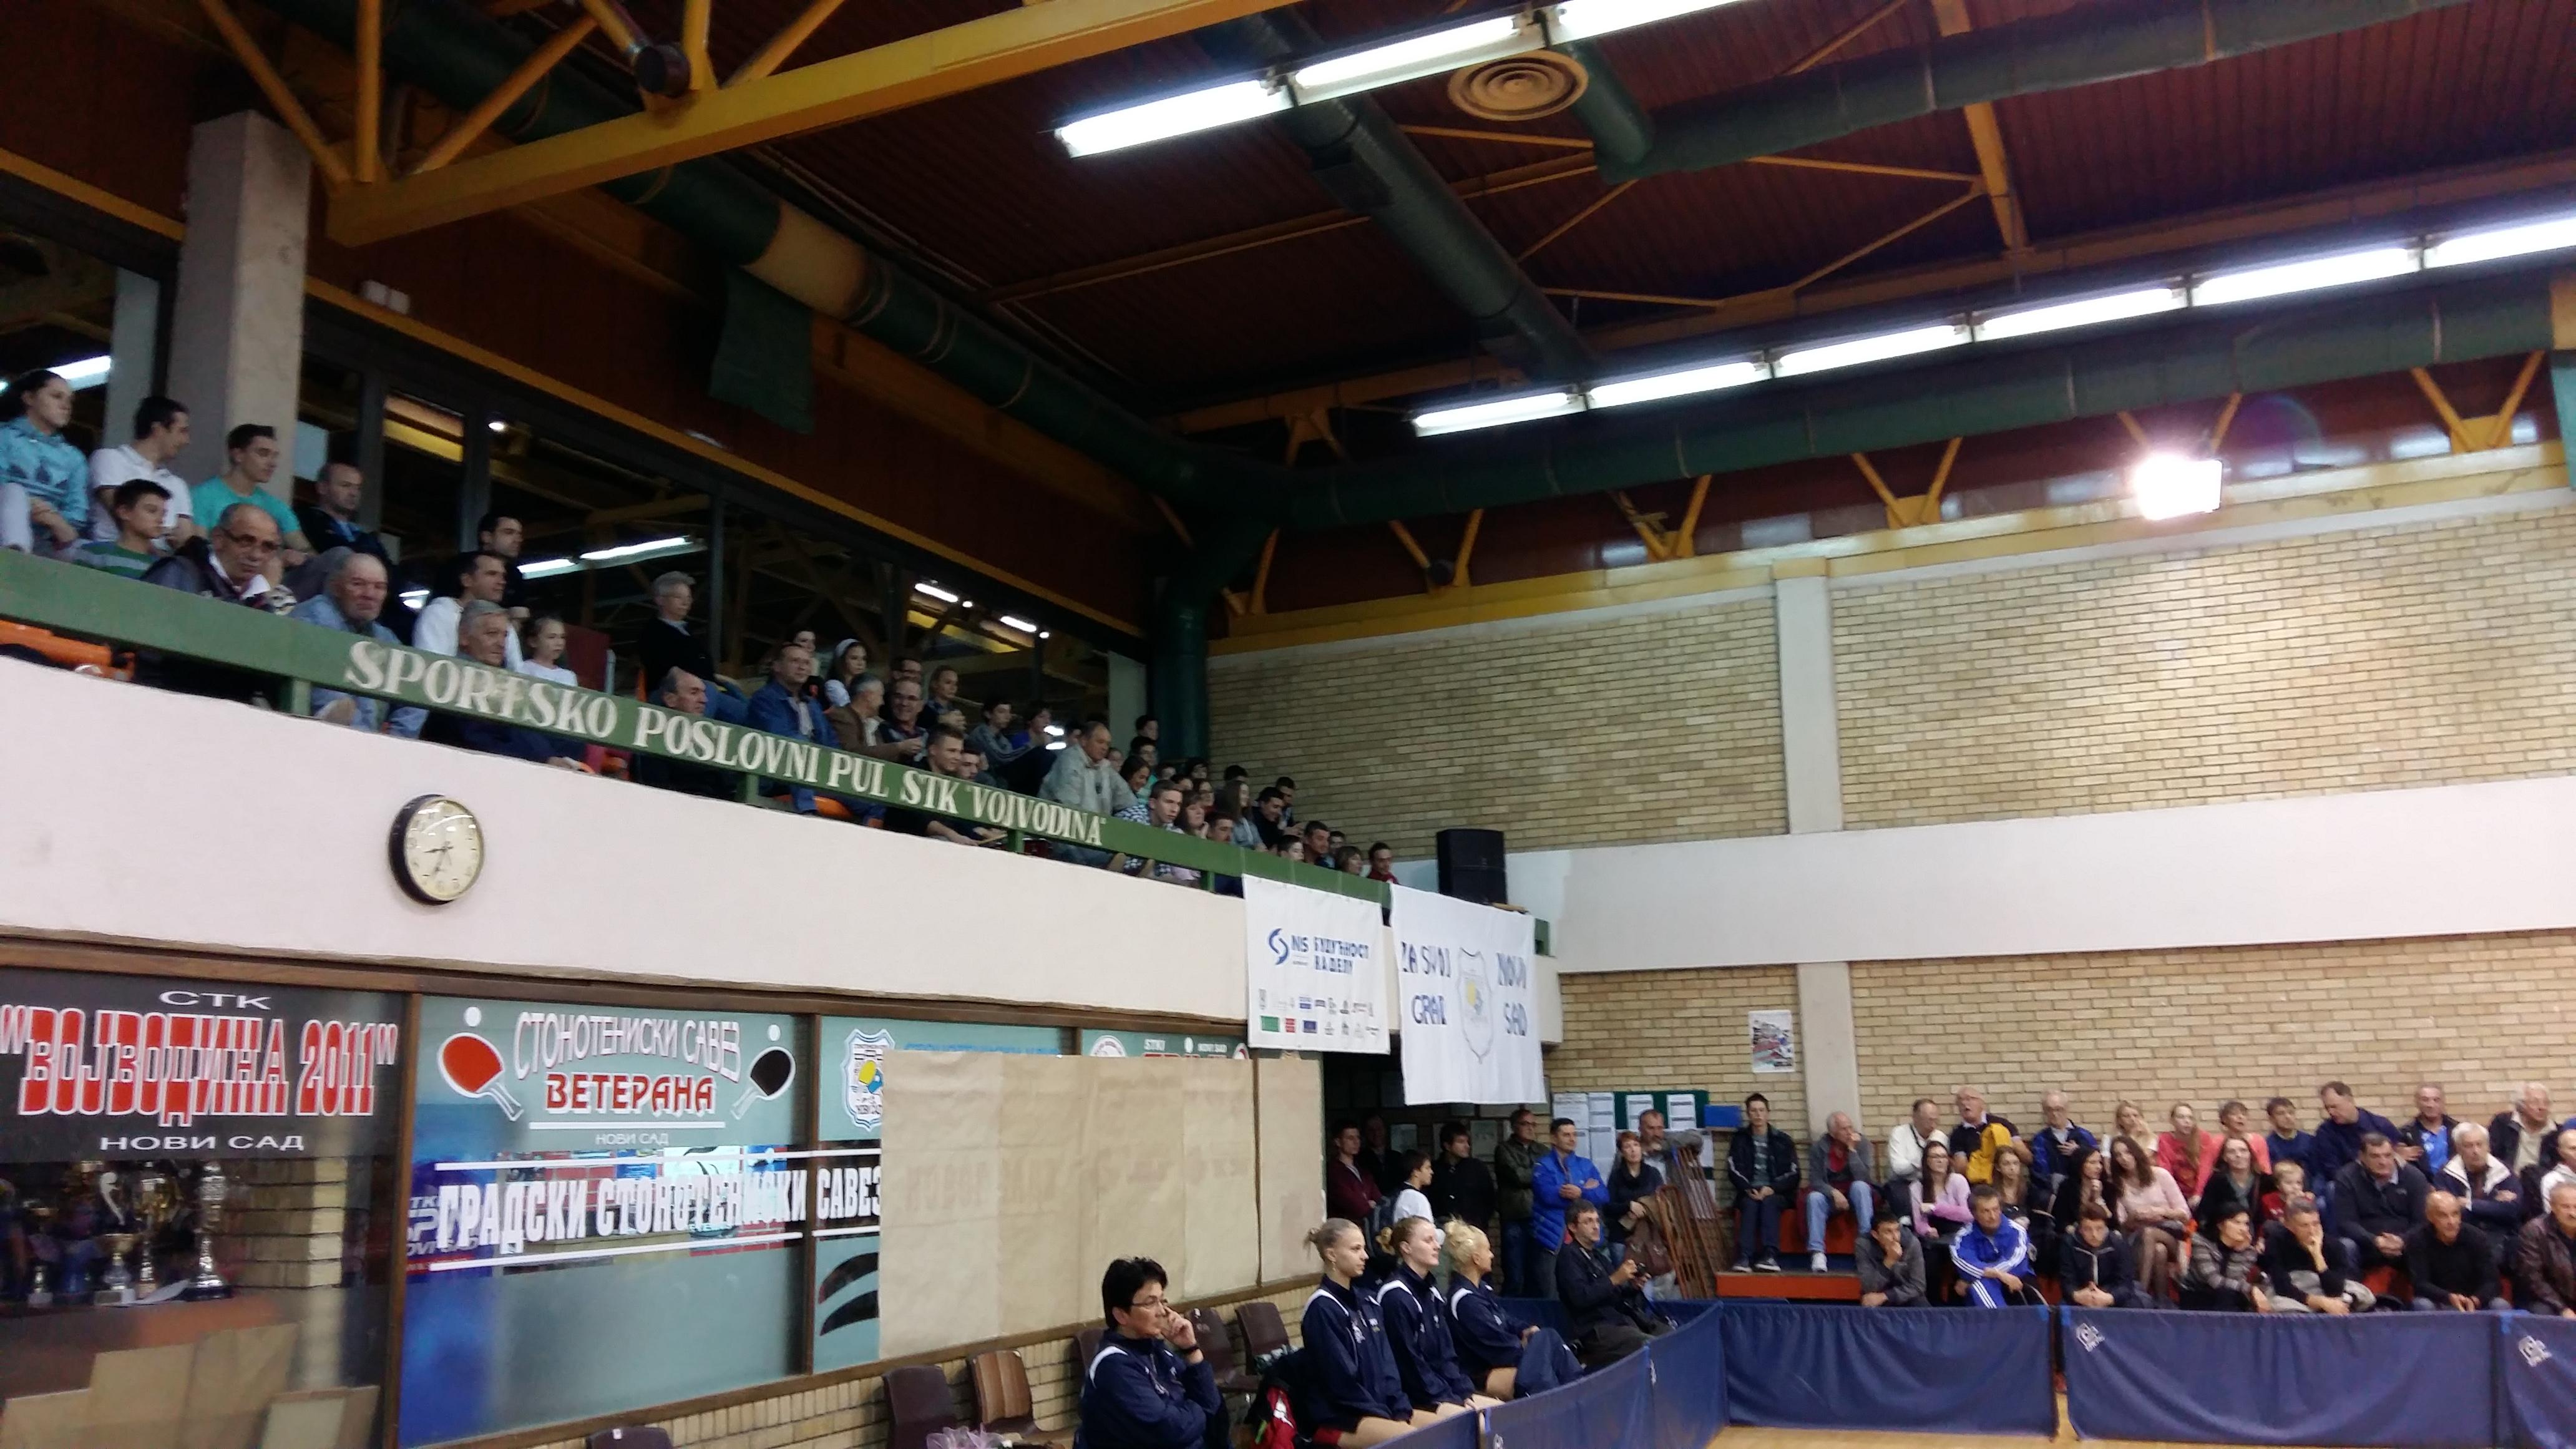 Ettu Cup N.Sad - Dumbrovica, Rumunija (novembar 2015)